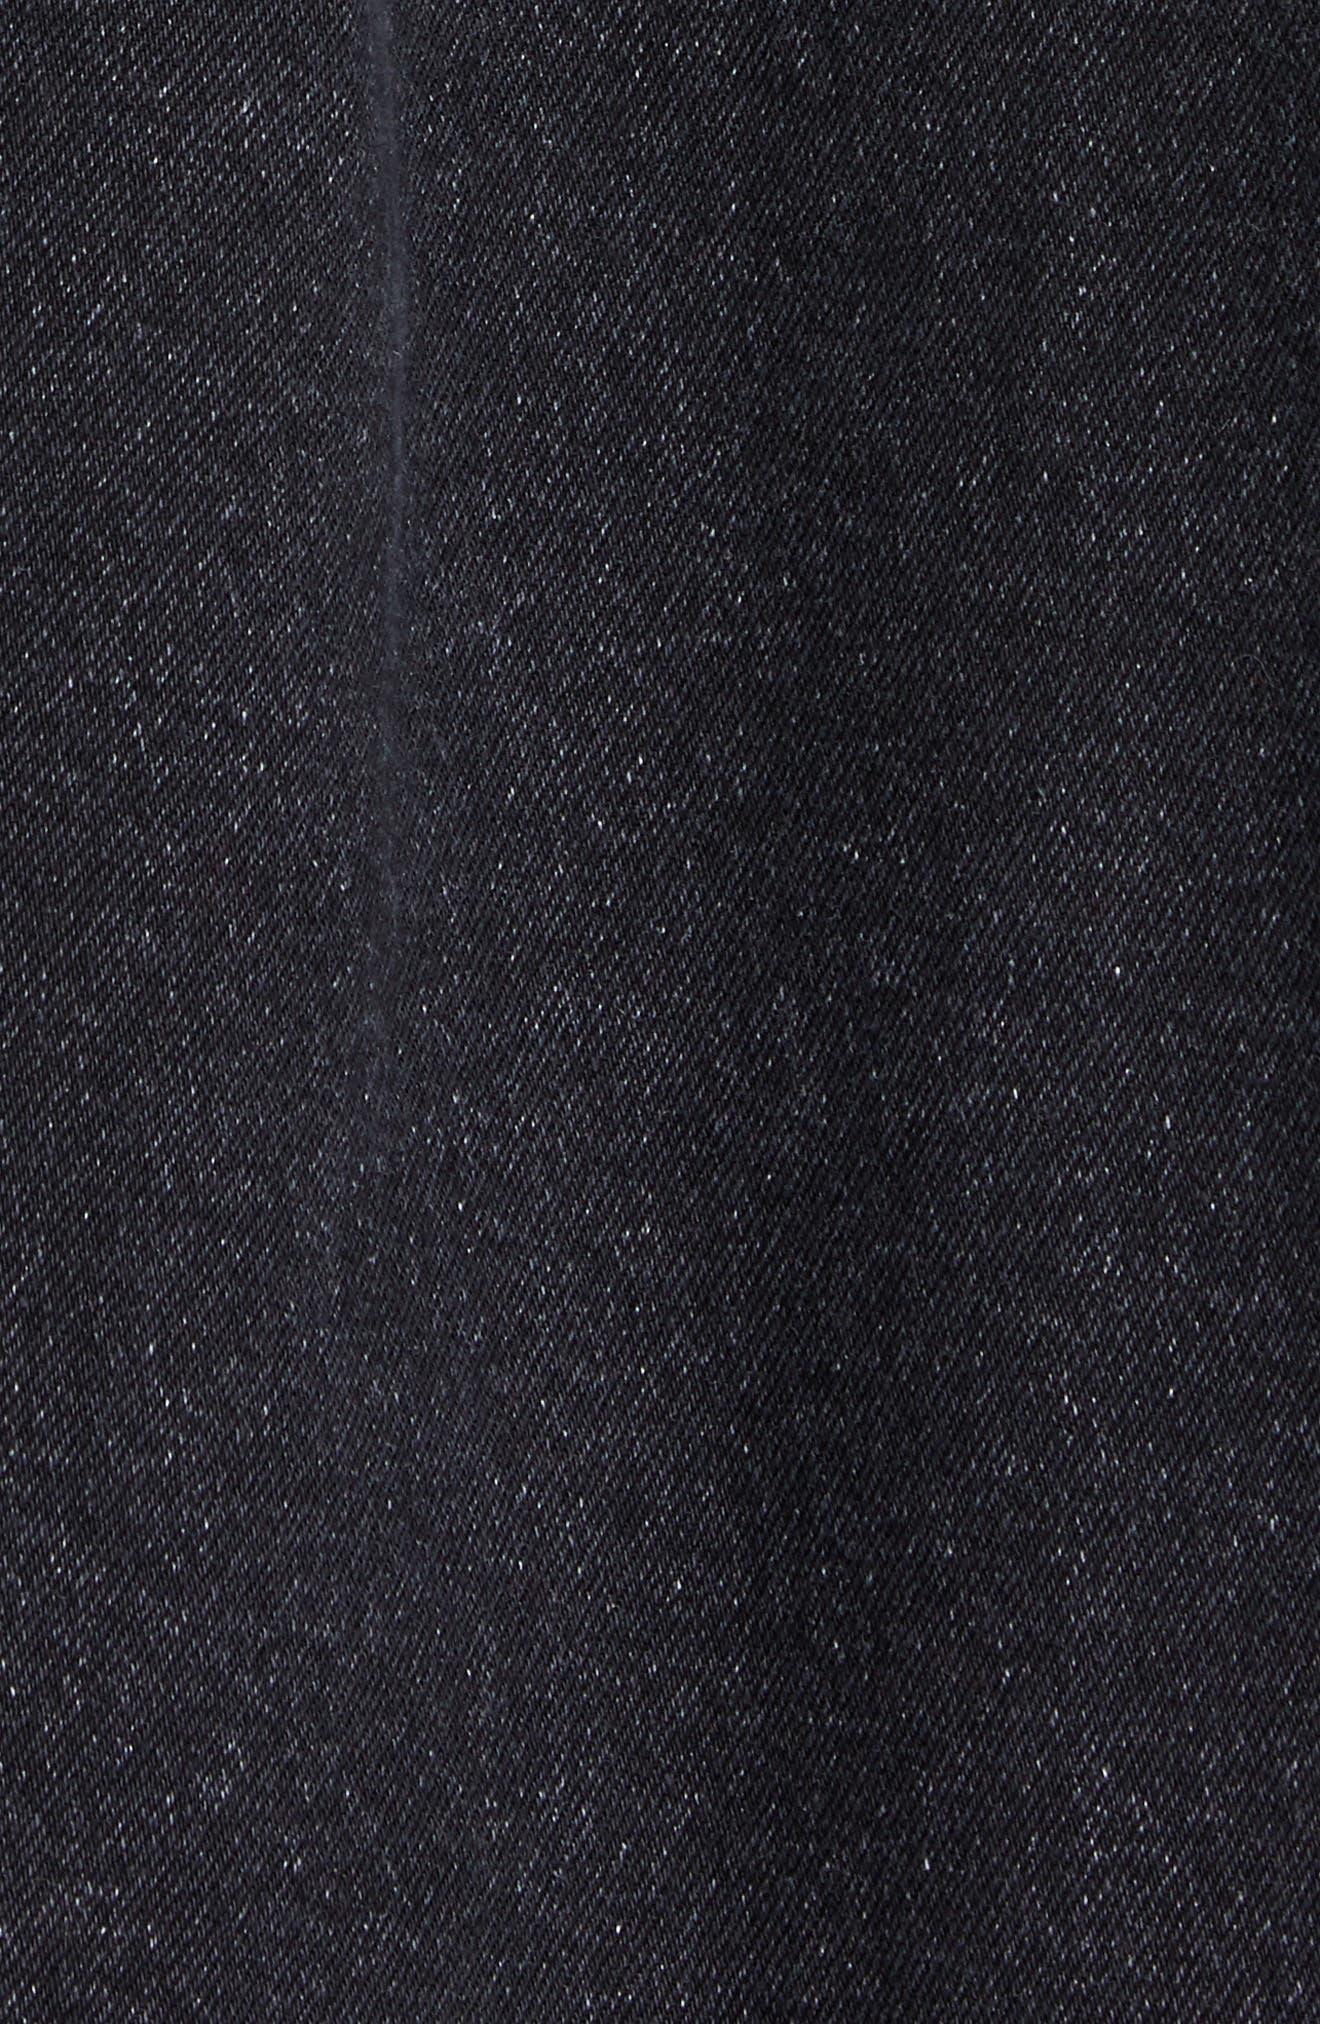 JUUN.J, Denim Shirt with Detachable Hood, Alternate thumbnail 5, color, BLACK